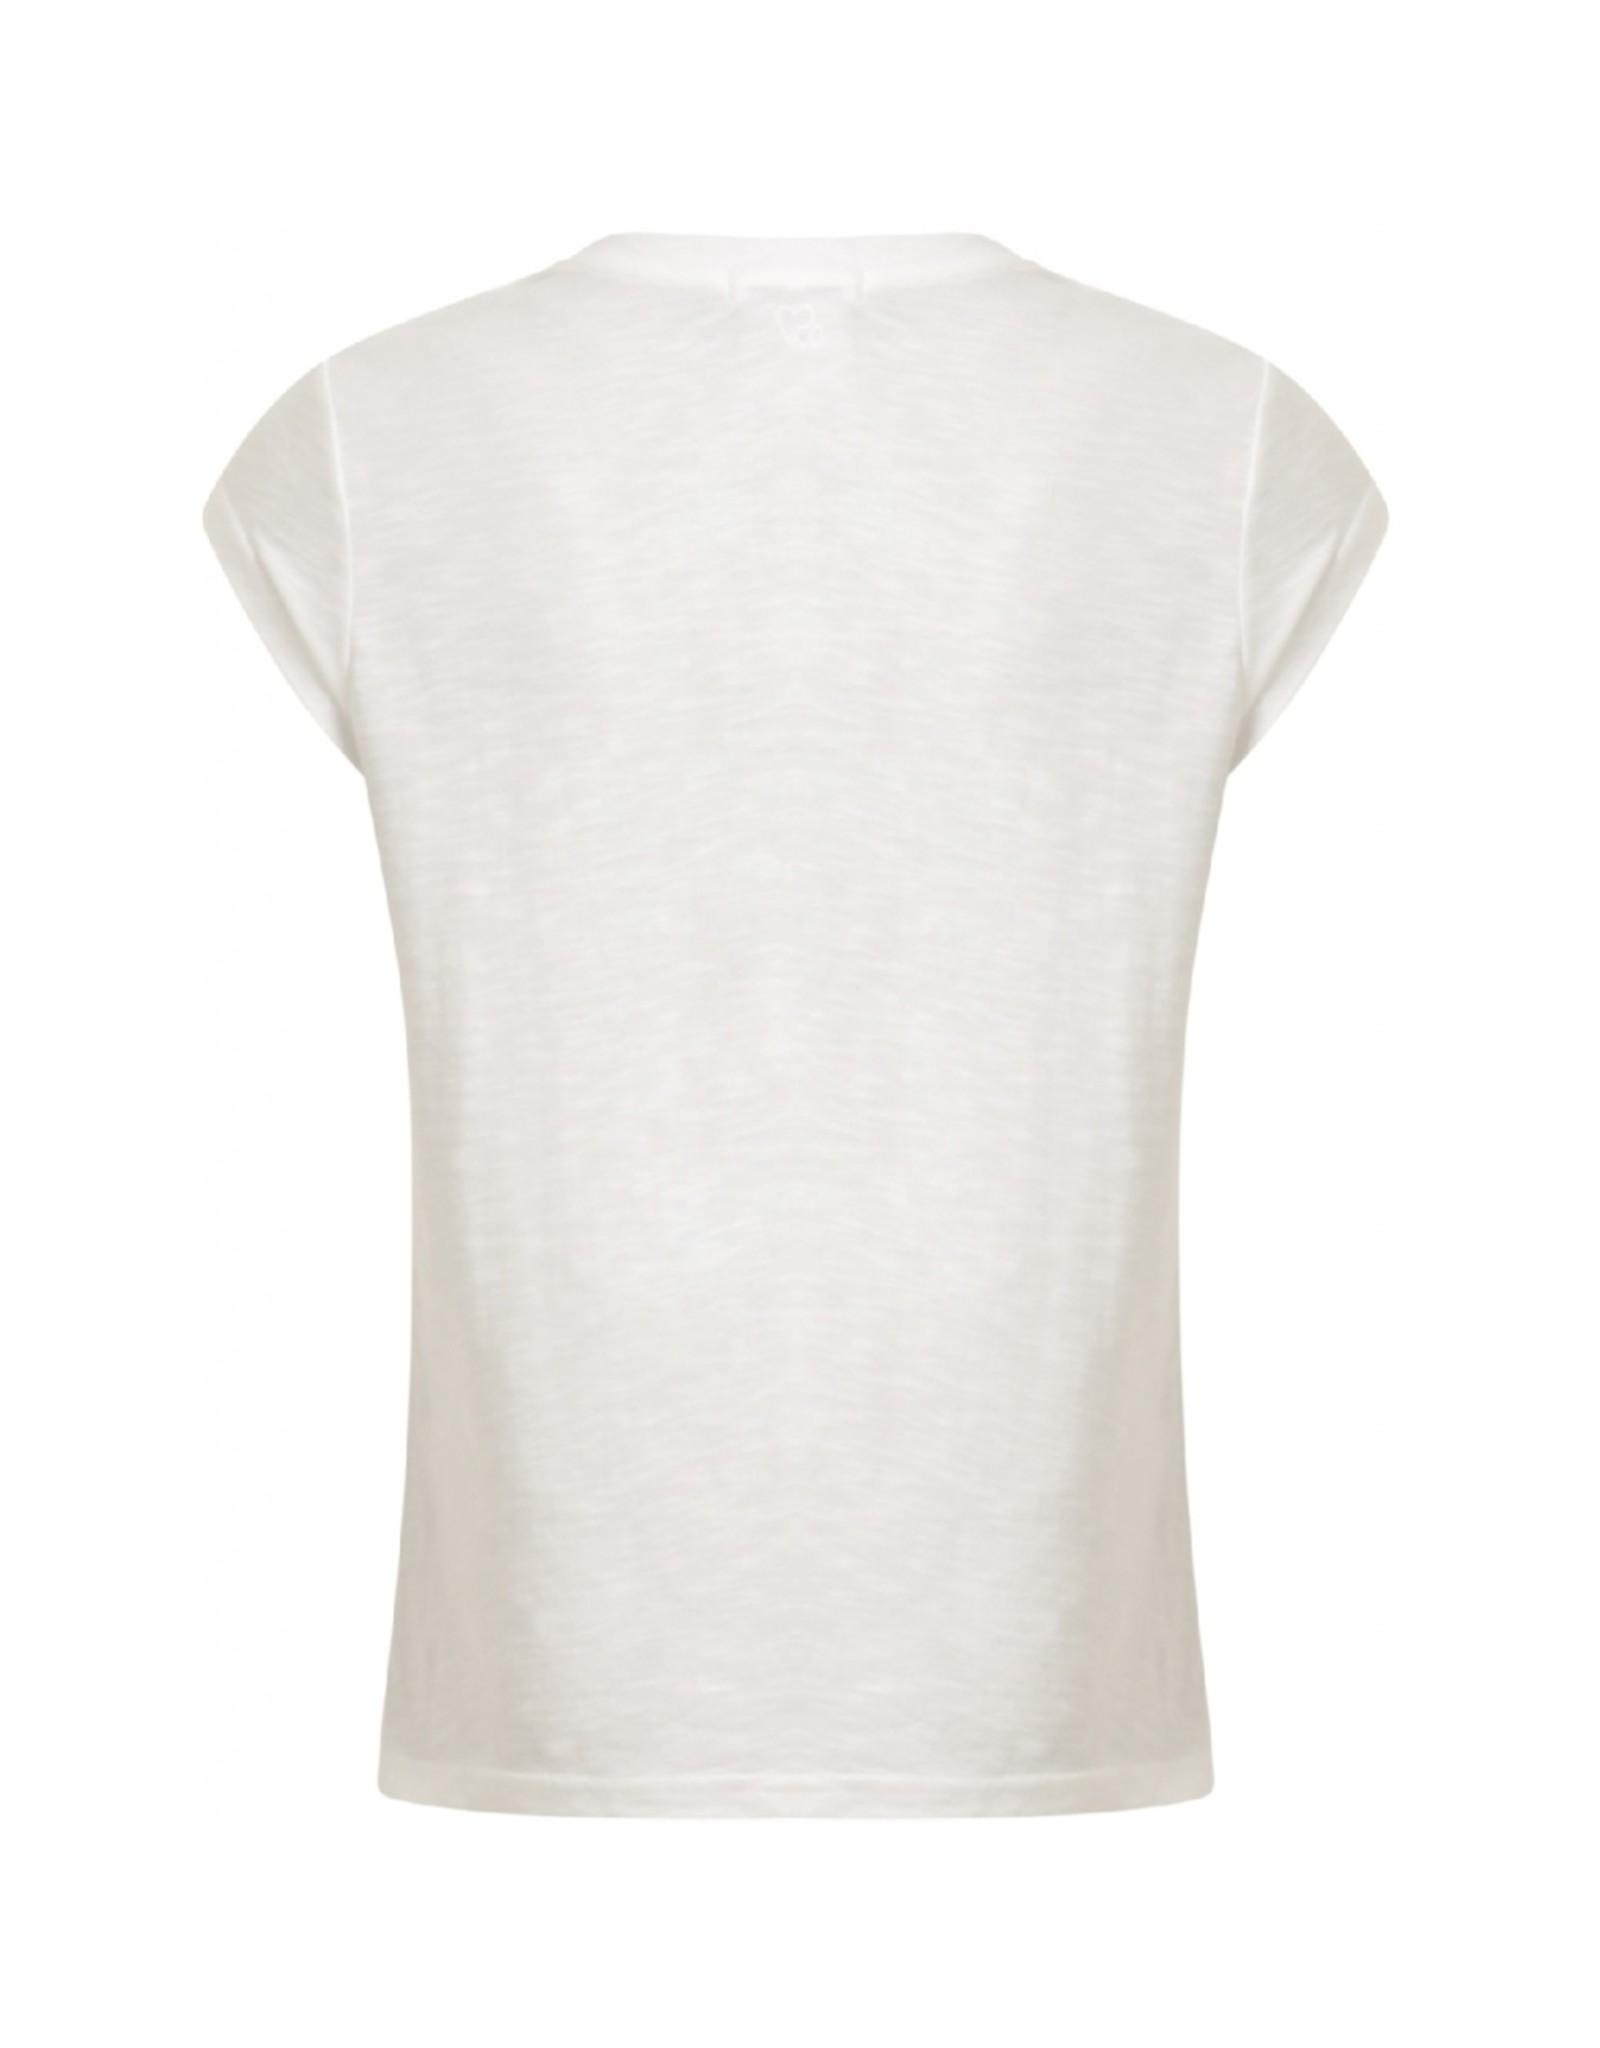 Coster Copenhagen T-shirt CosterV White